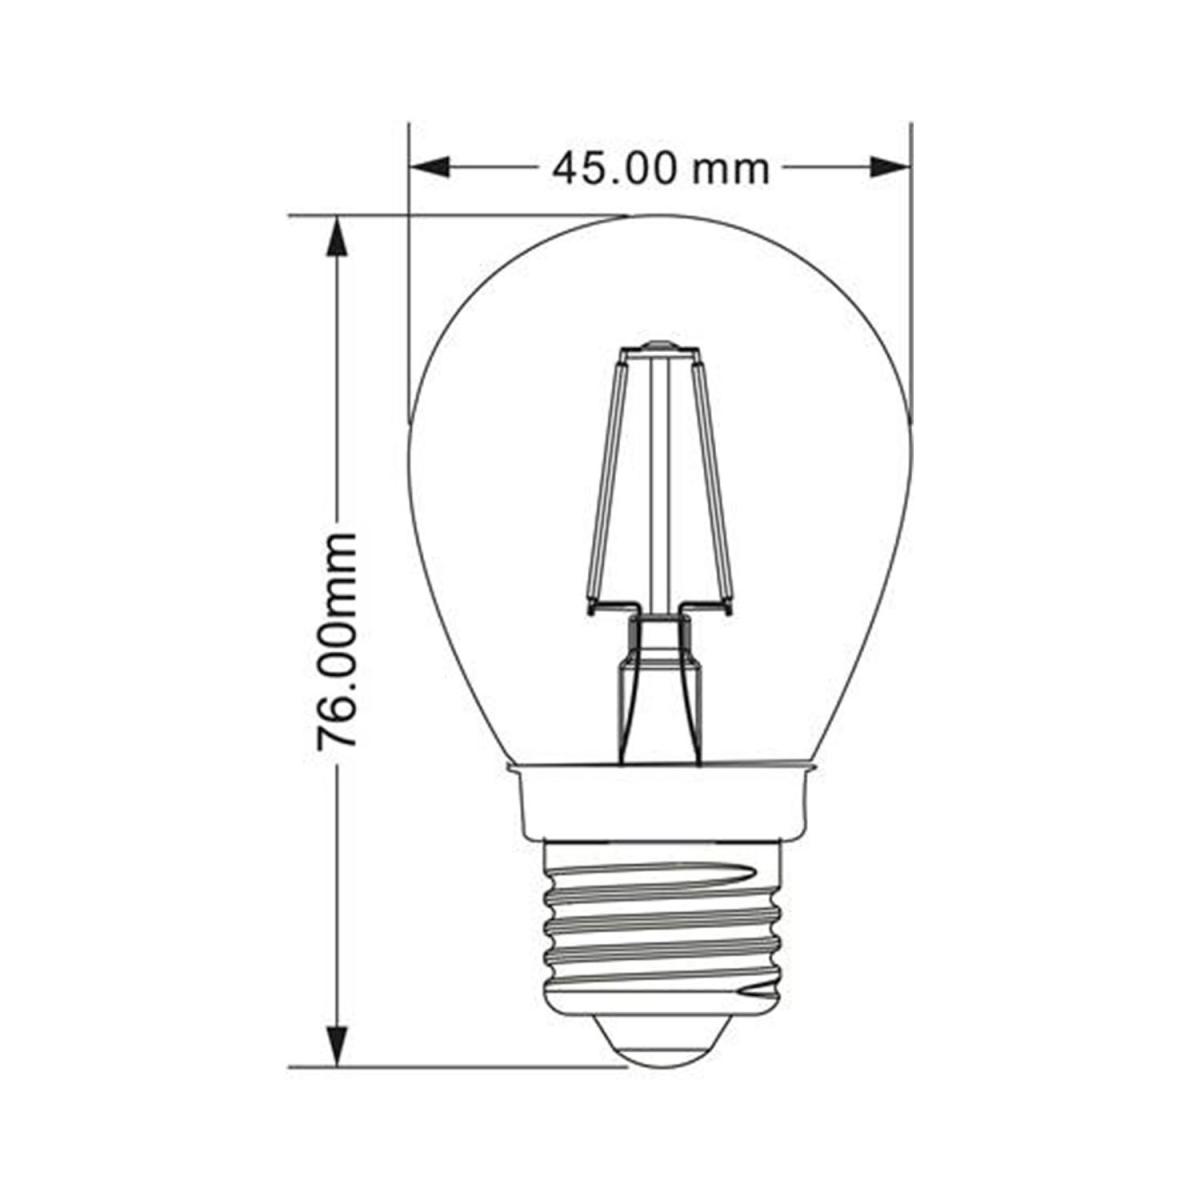 4 Watt LED E14 Leuchtmittel 2700 Kelvin Leuchte 400 Lumen Lampe warmweiß EEK A+